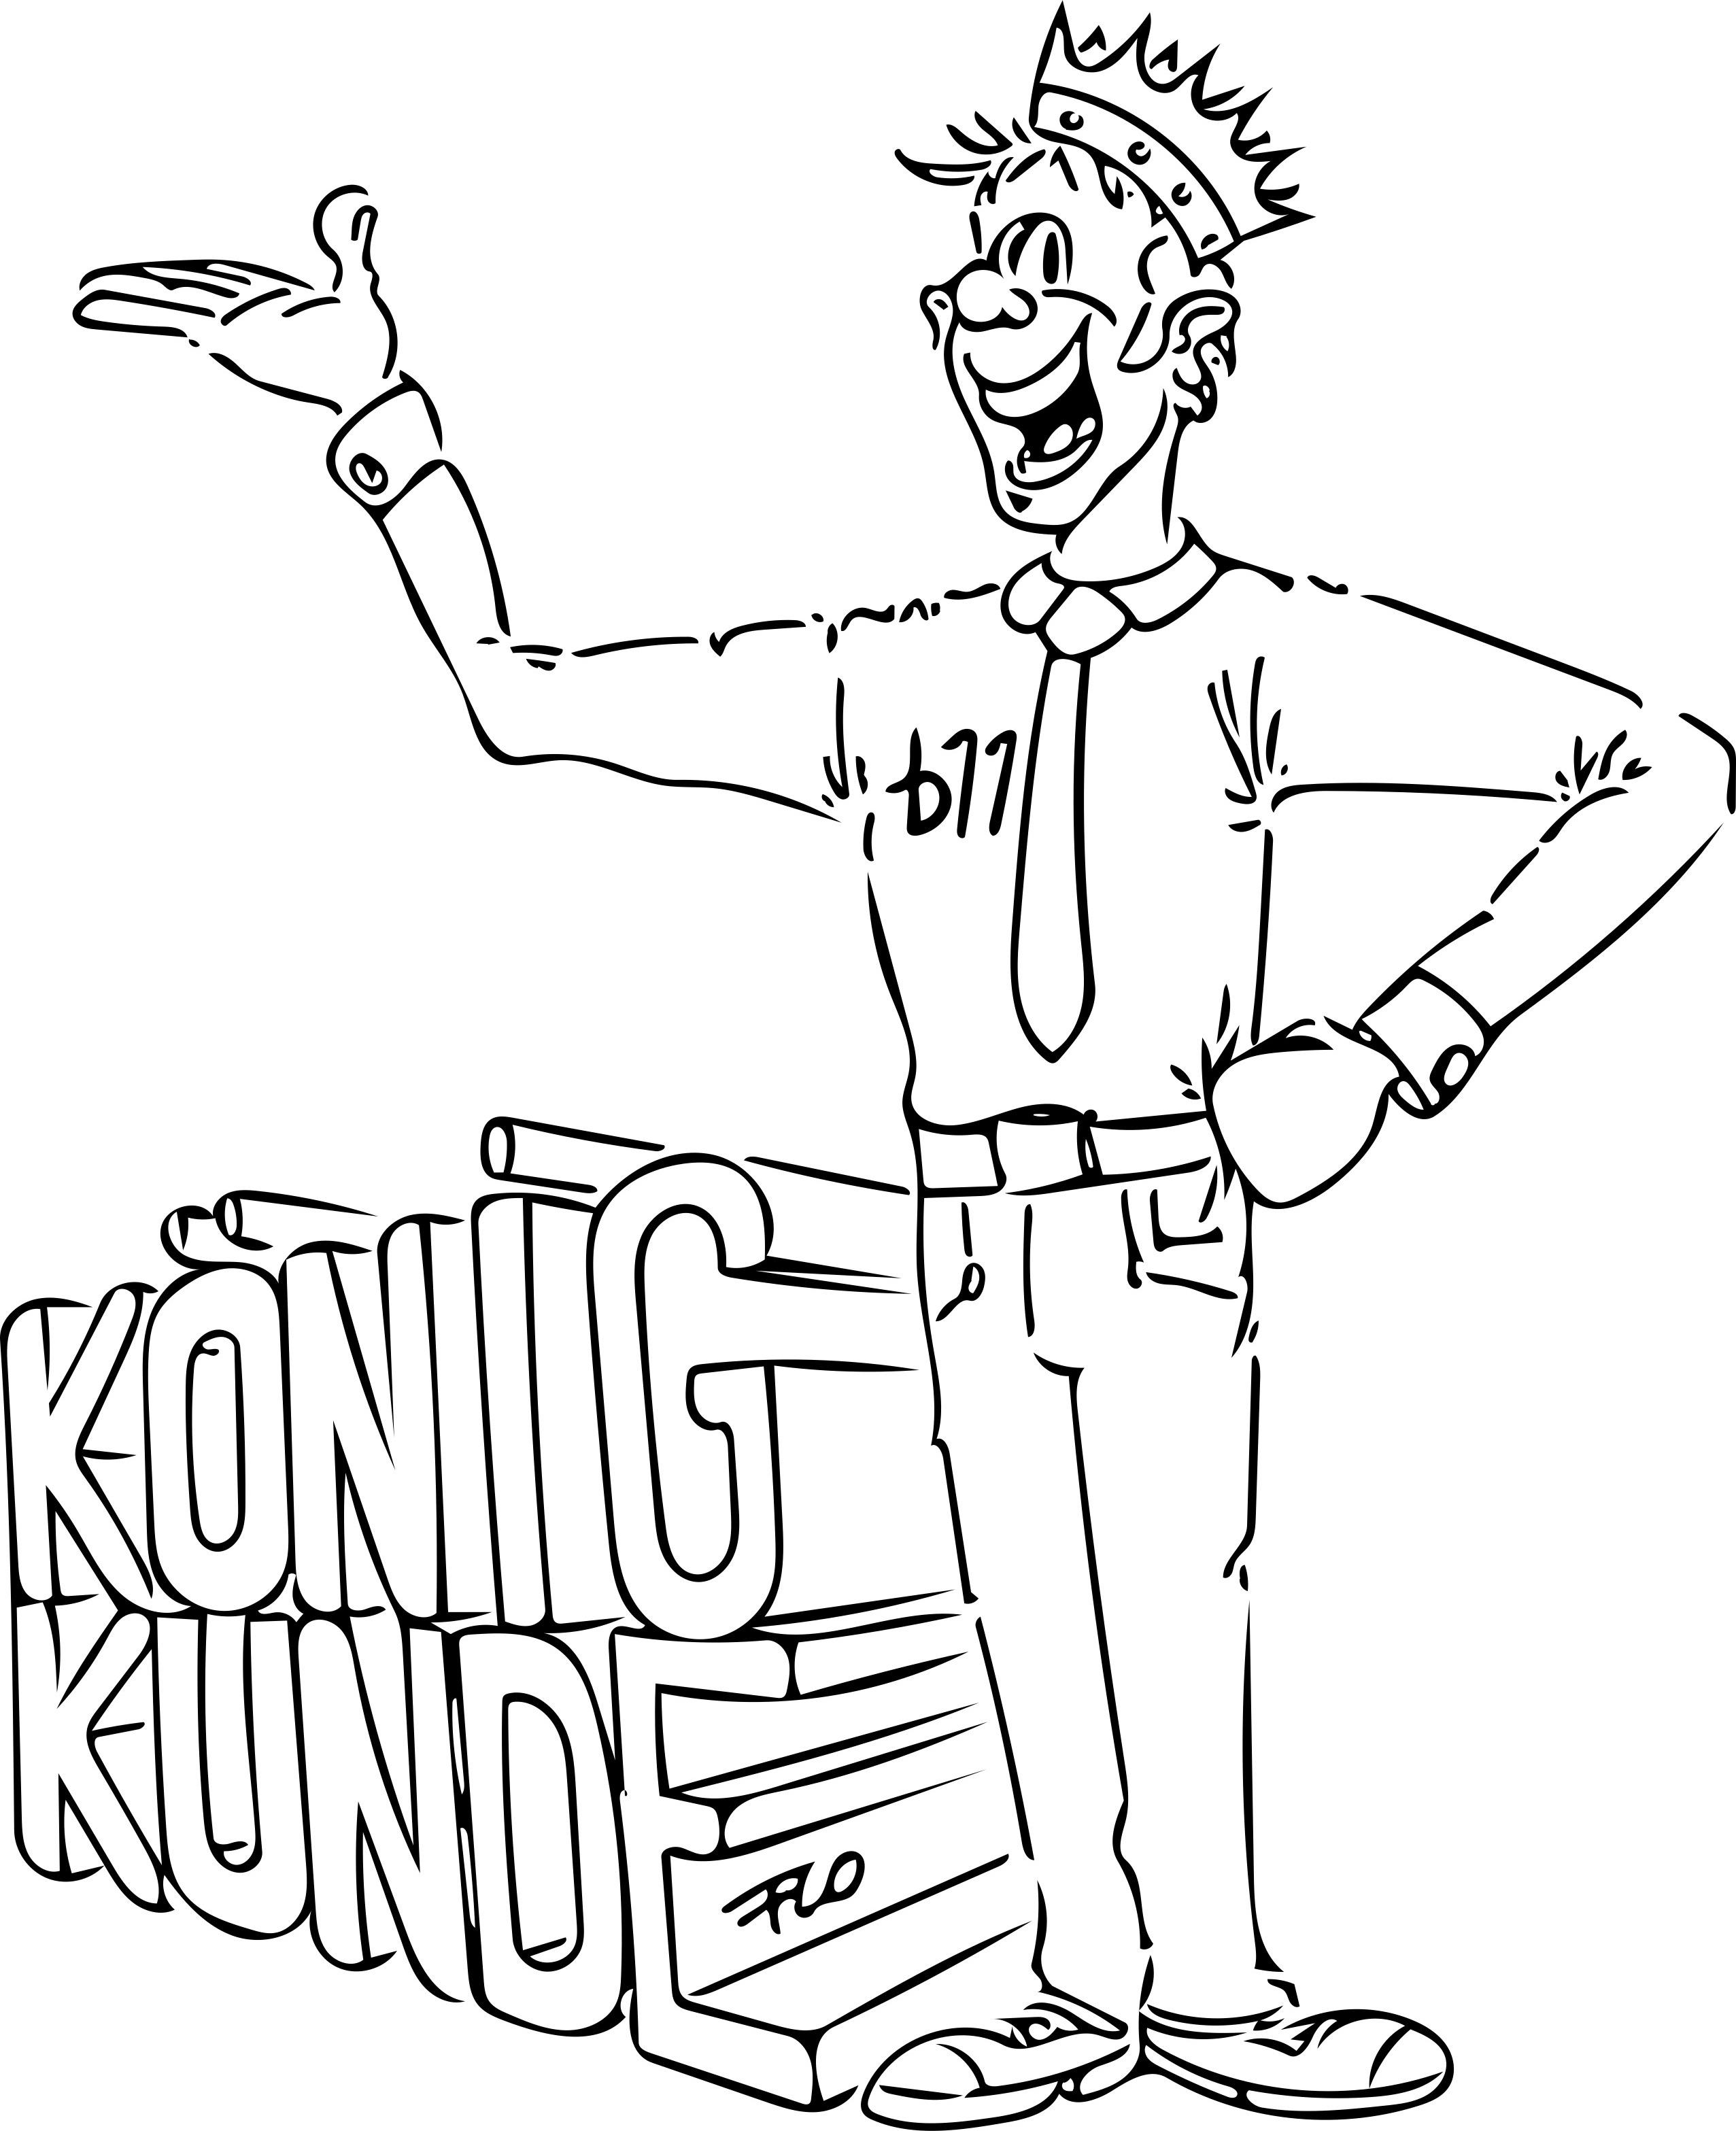 König Kunde - Service & Qualität